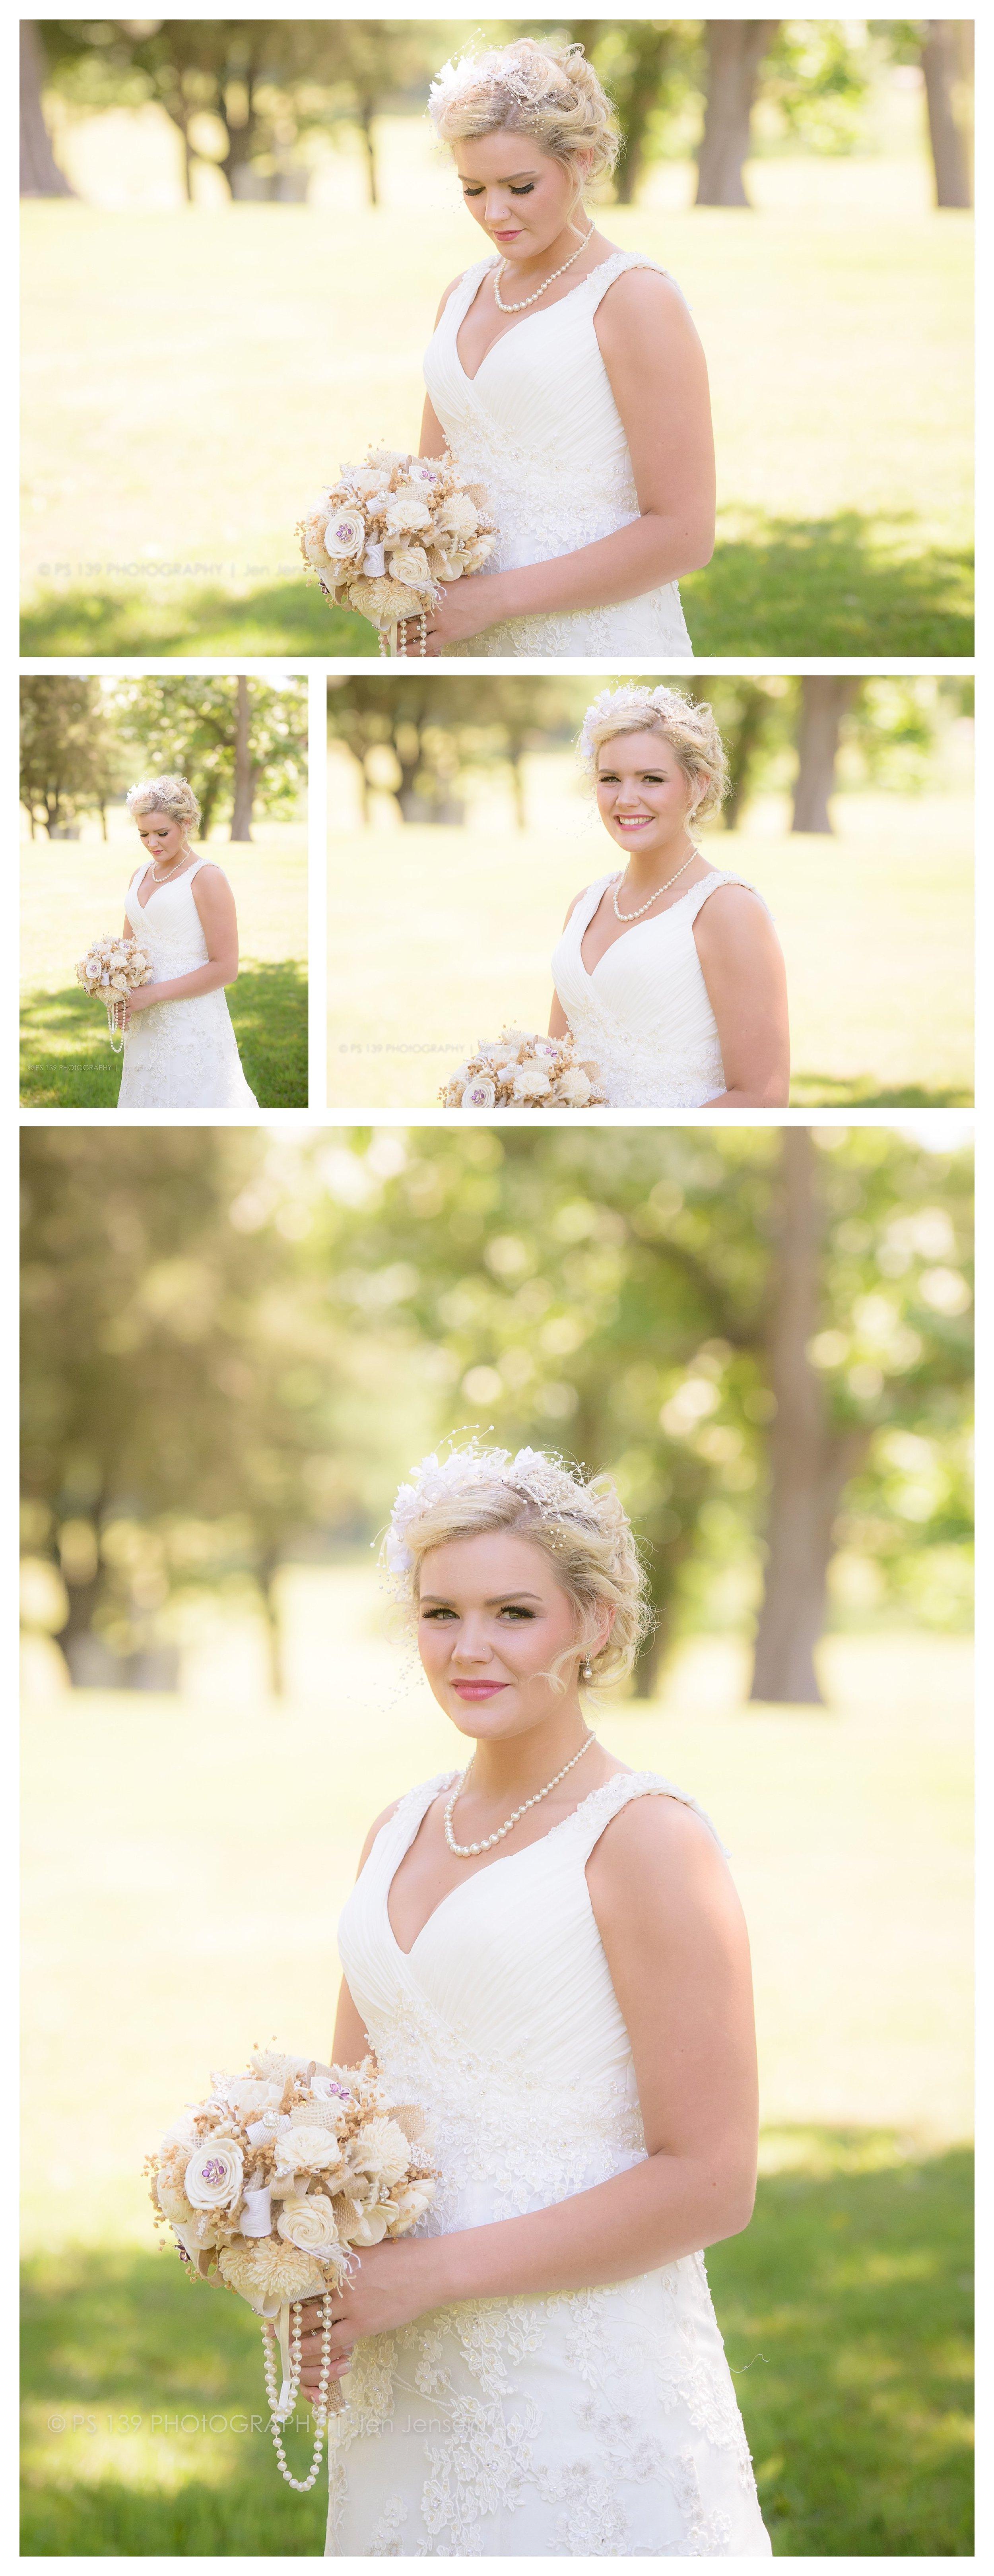 oregon Illinois oak lane farm wisconsin wedding photographer bayfield wi ps 139 photography jen jensen_0258.jpg